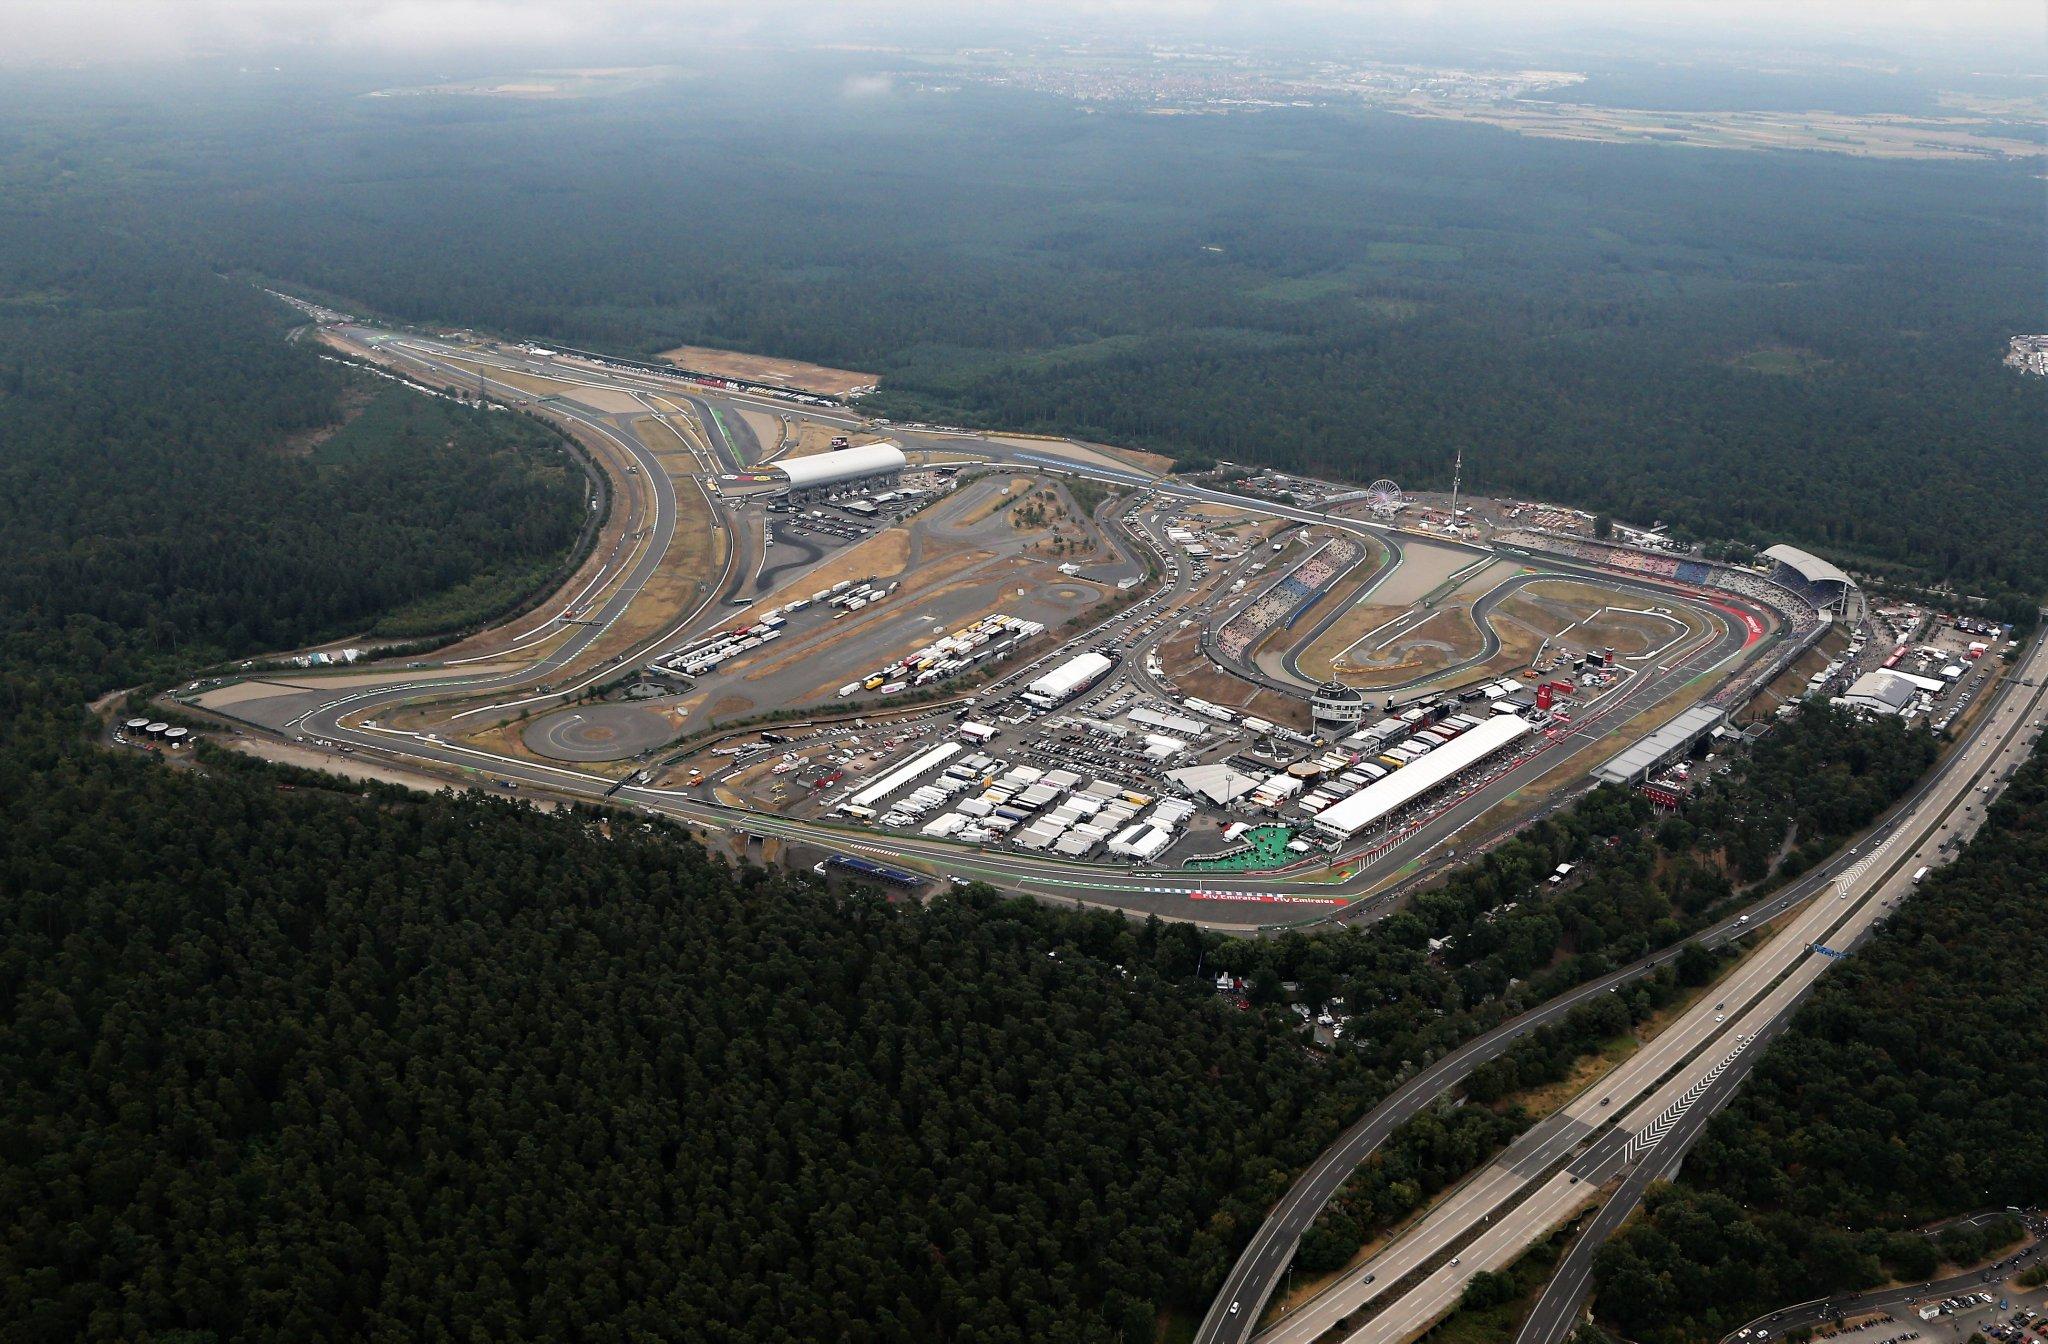 F1 German Grand Prix 2019 .jpg